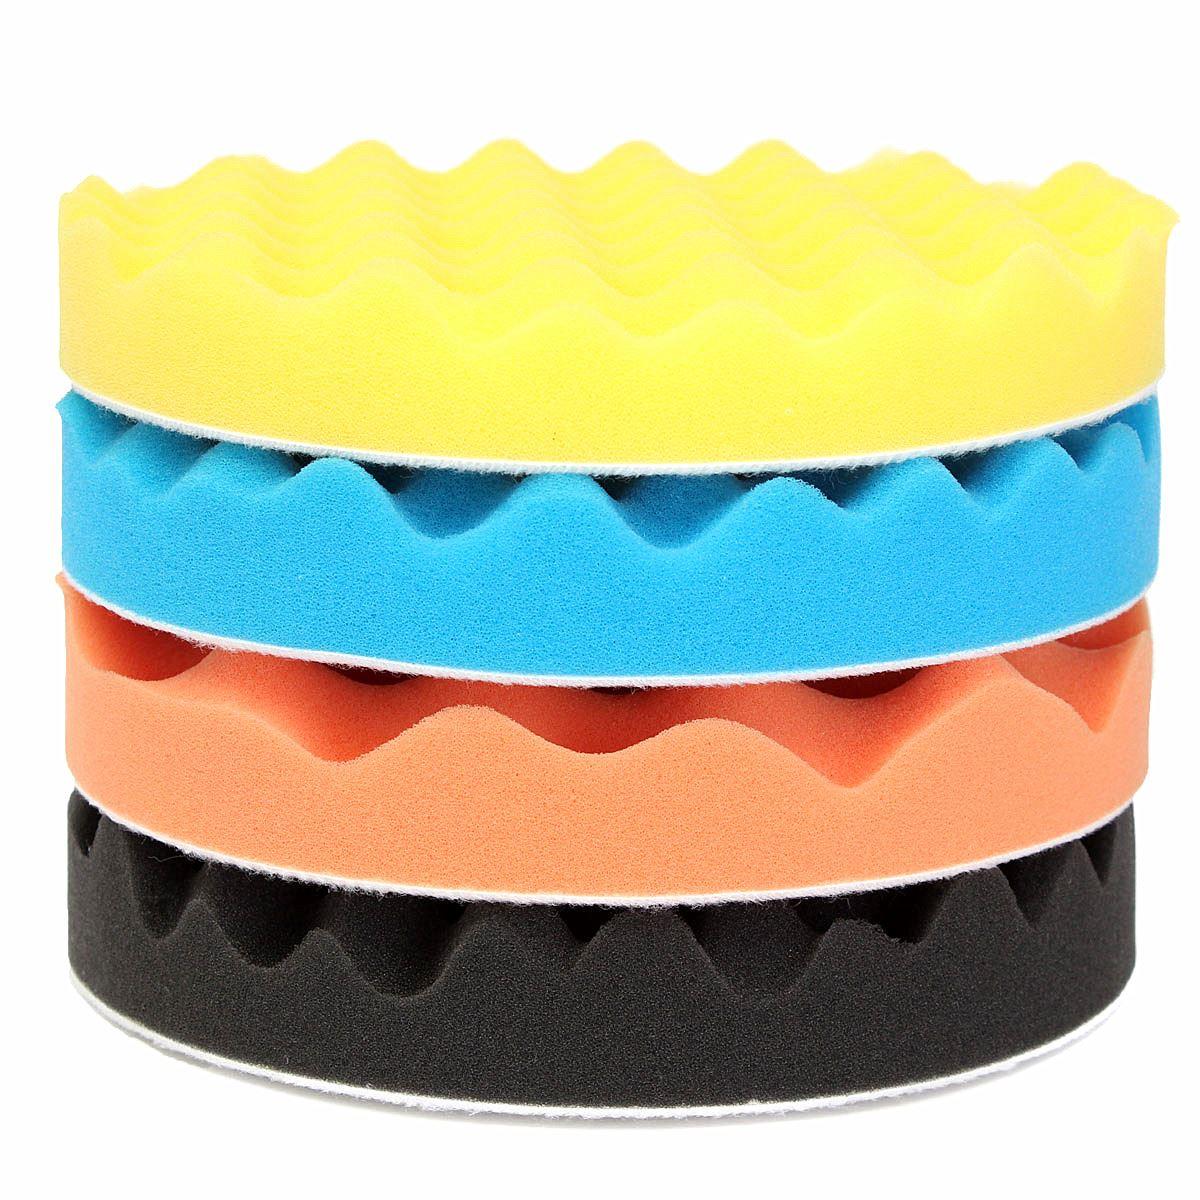 4Pcs 7 Inch/180mm Sponge Waffle Polishing Buffer Pad Foam Buffing Pad Kit For Car Polisher Pads 7 inch(China (Mainland))